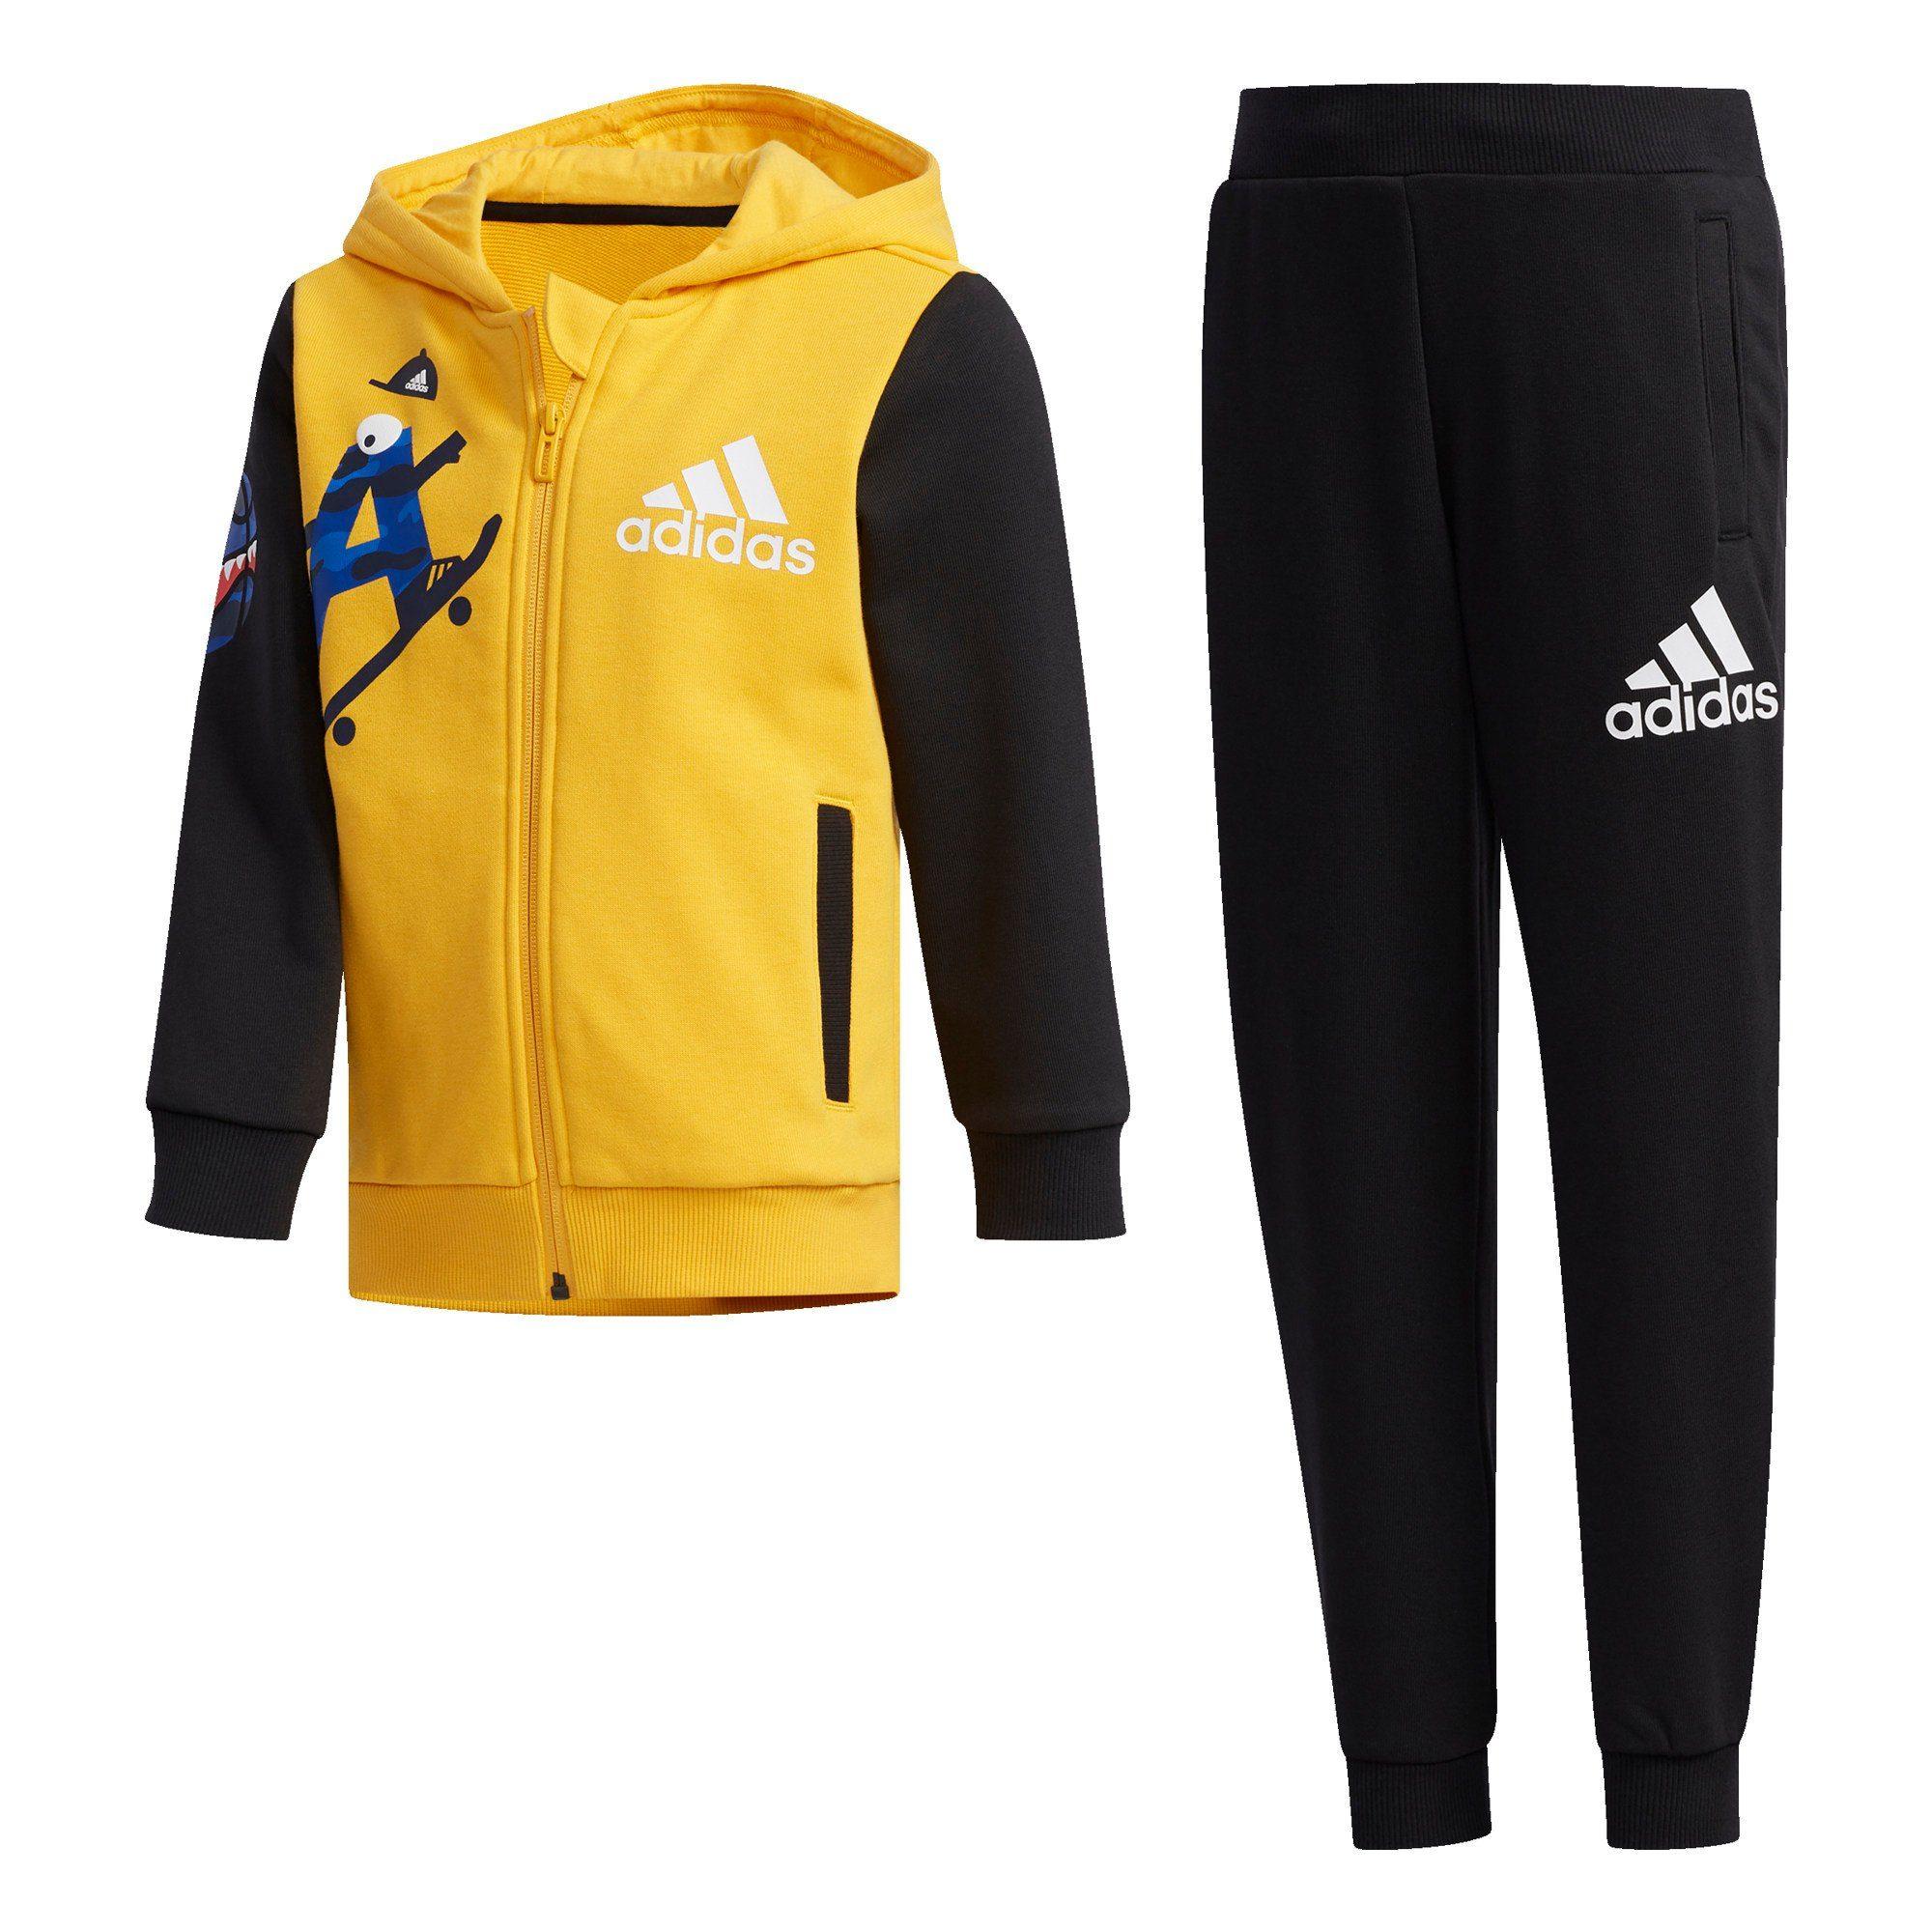 adidas Performance Trainingsanzug »LK GFX HDY SET«, Clima;RDY online kaufen | OTTO